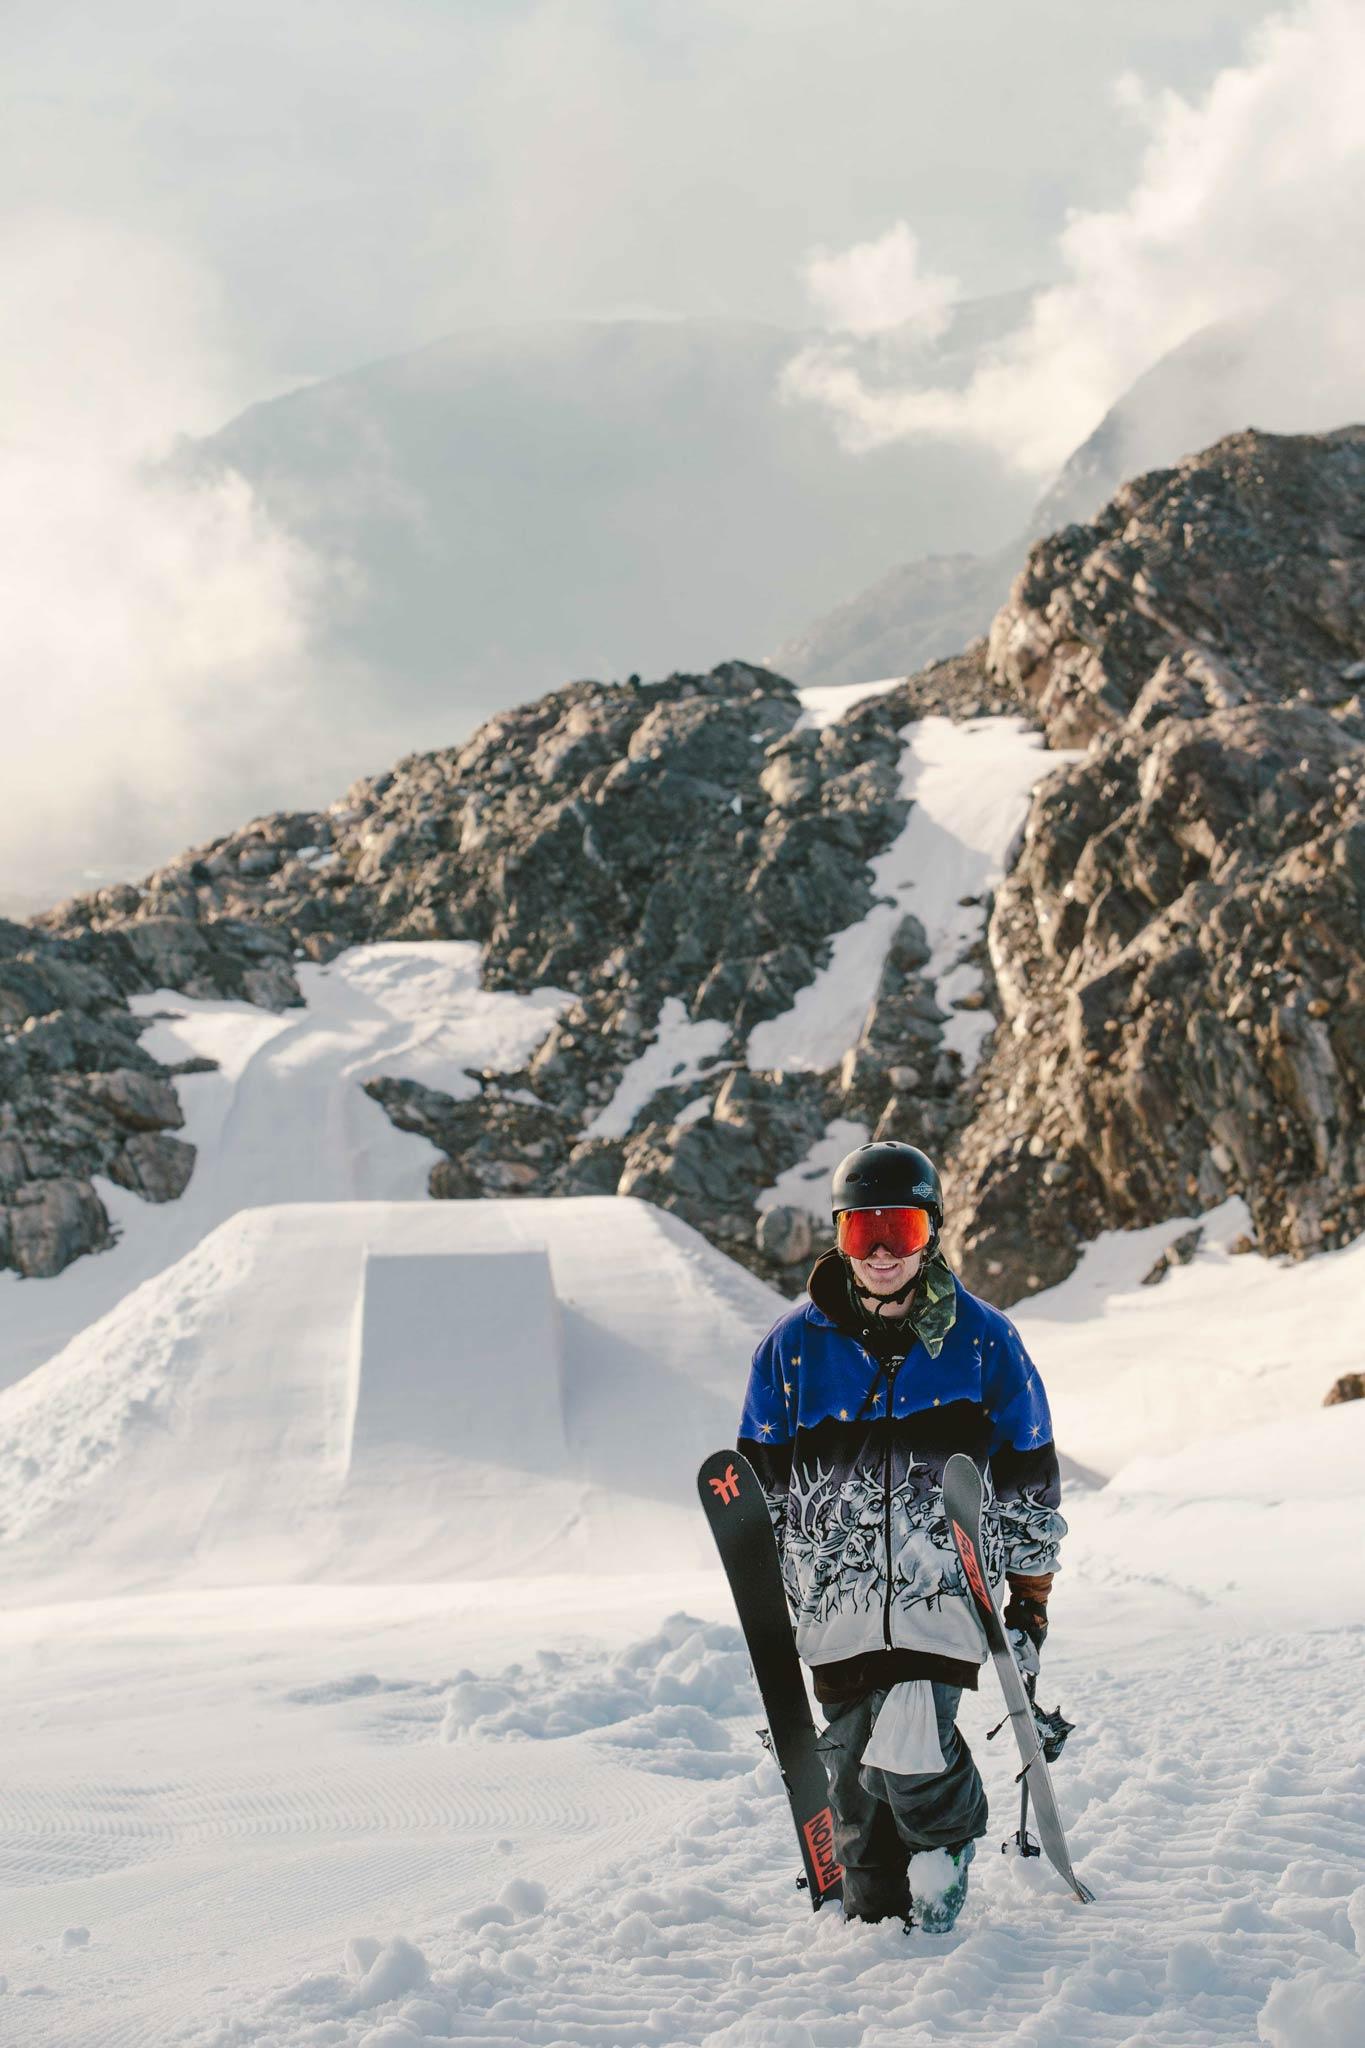 Rider: Antti Ollila - Foto: Chris Baldry